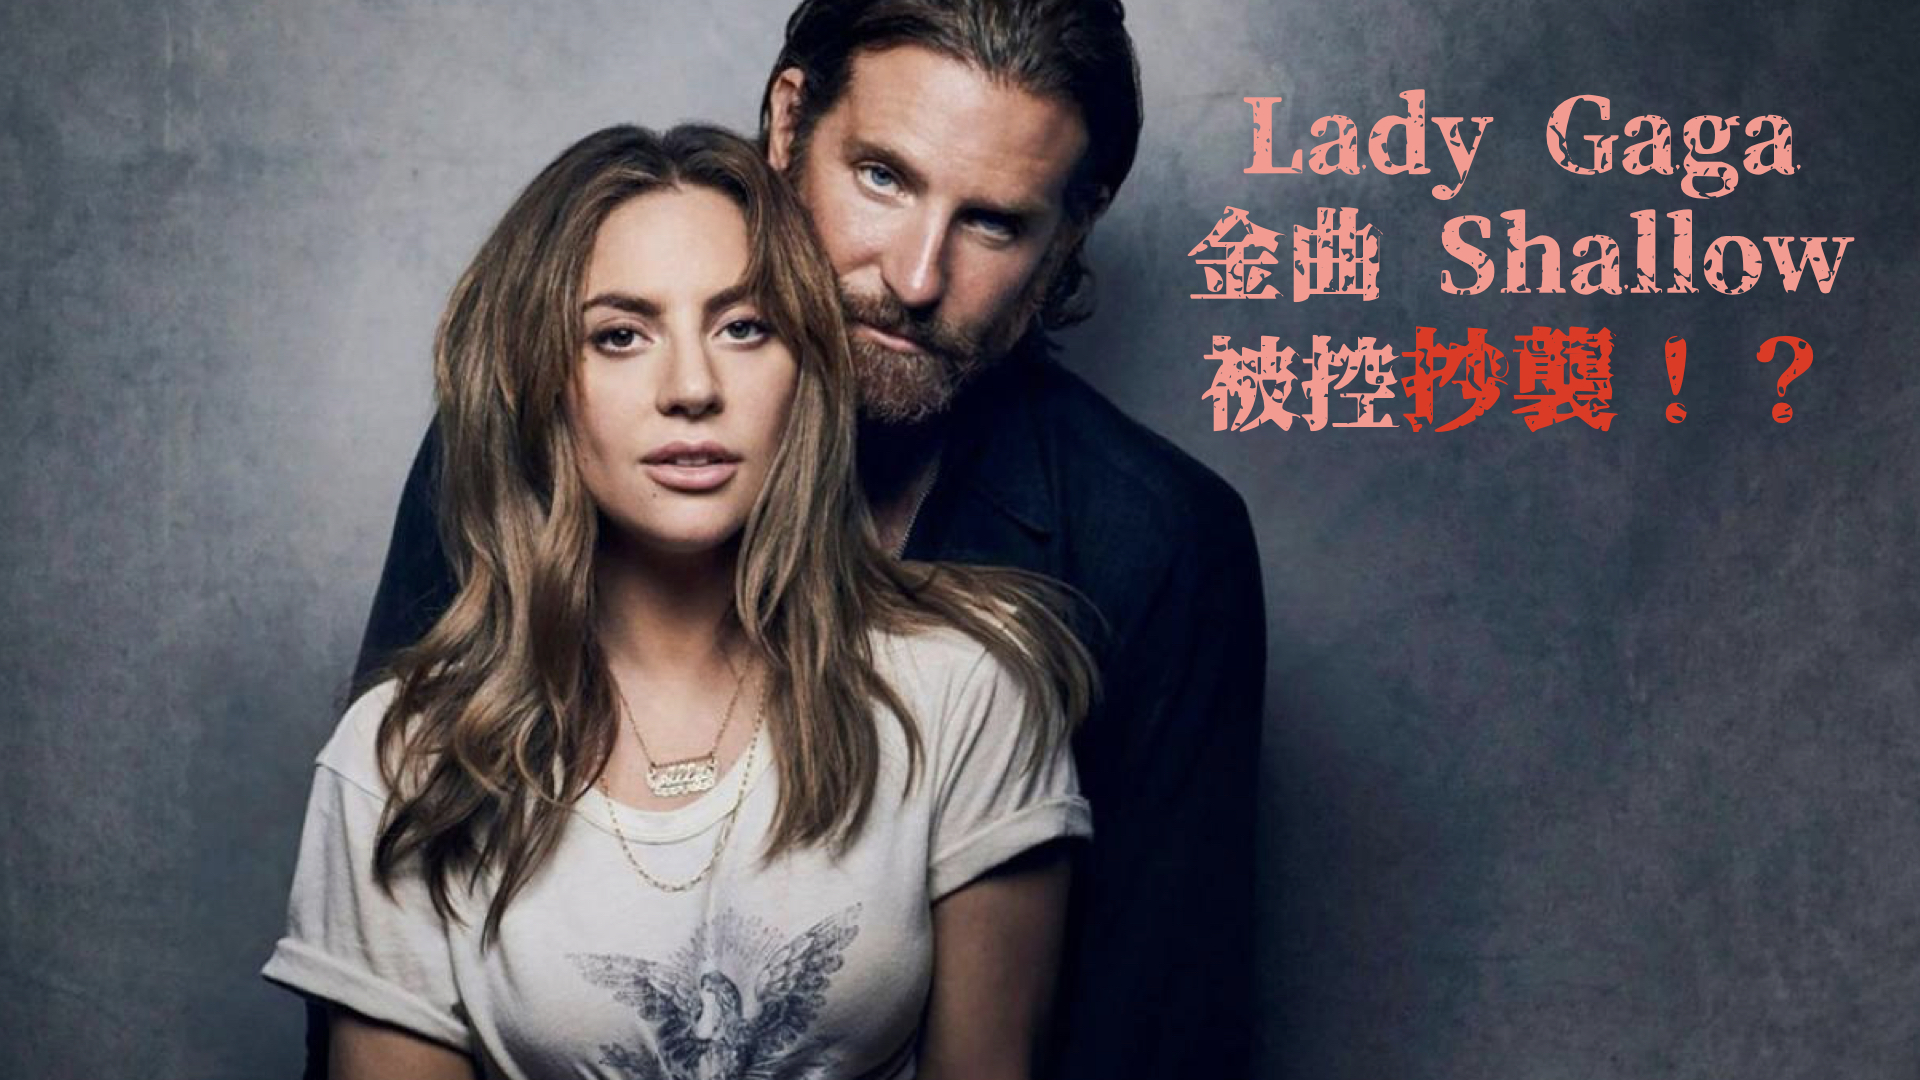 Lady Gaga Shallow 一個巨星的誕生奧斯卡金獎歌曲 被提起抄襲告訴!?